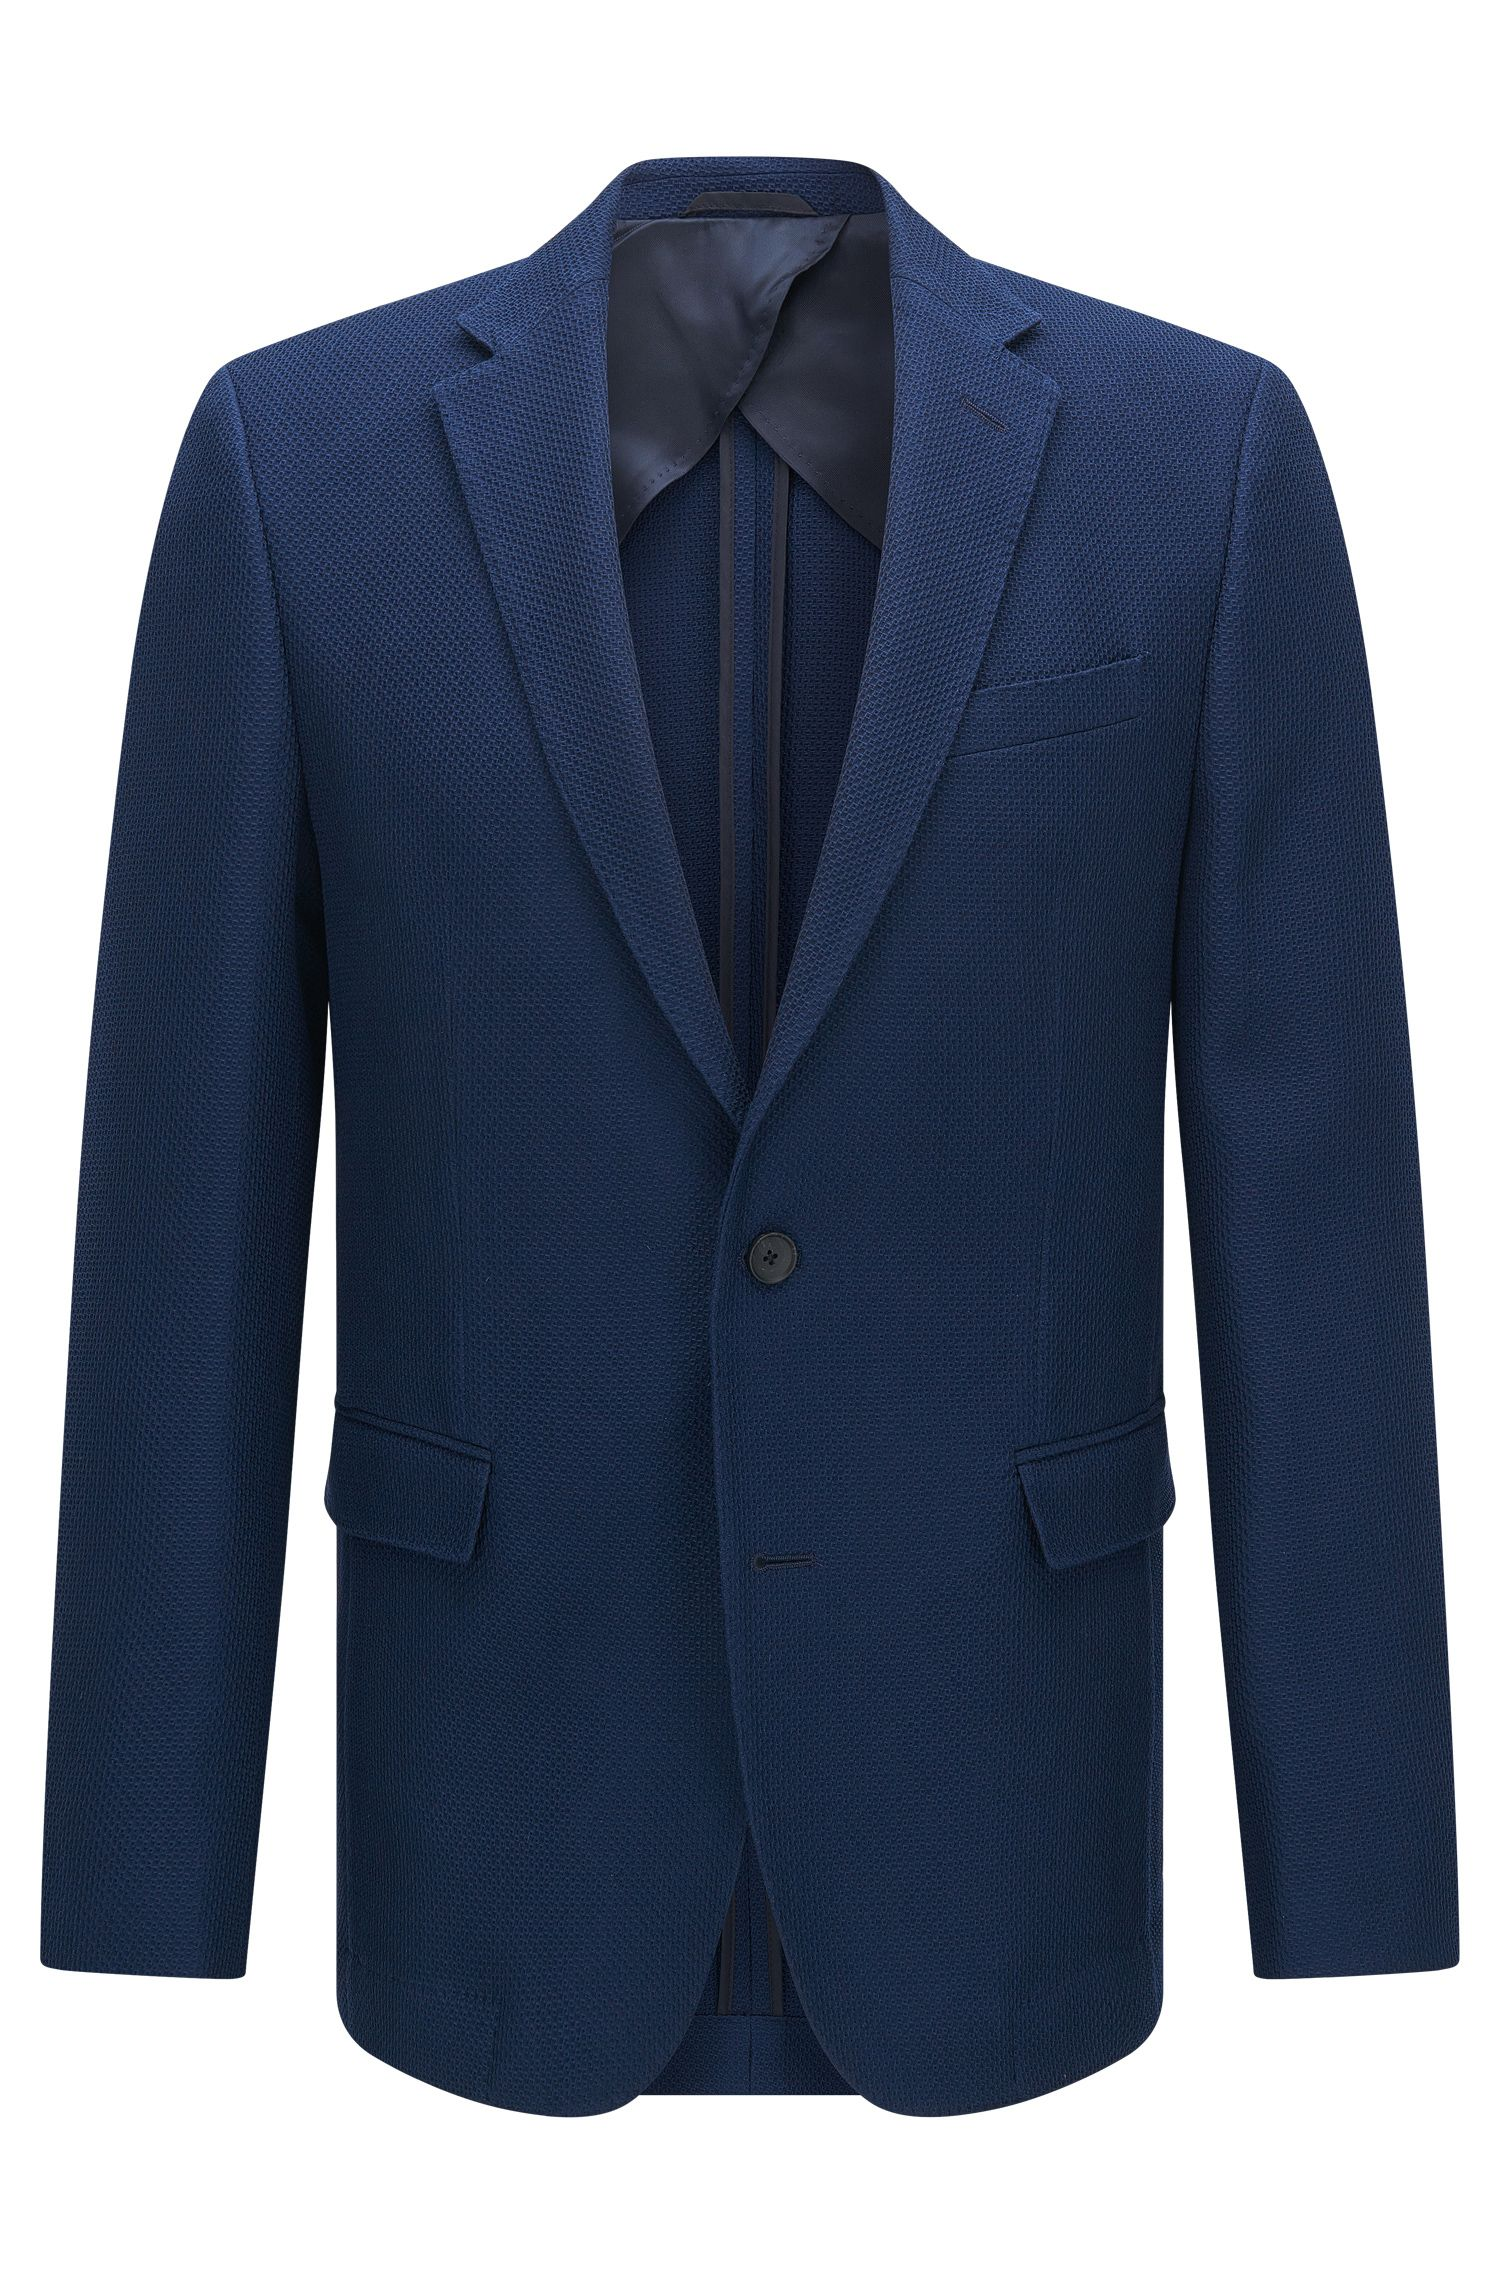 'Nobis' | Slim Fit, Virgin Wool Cotton Sport Coat